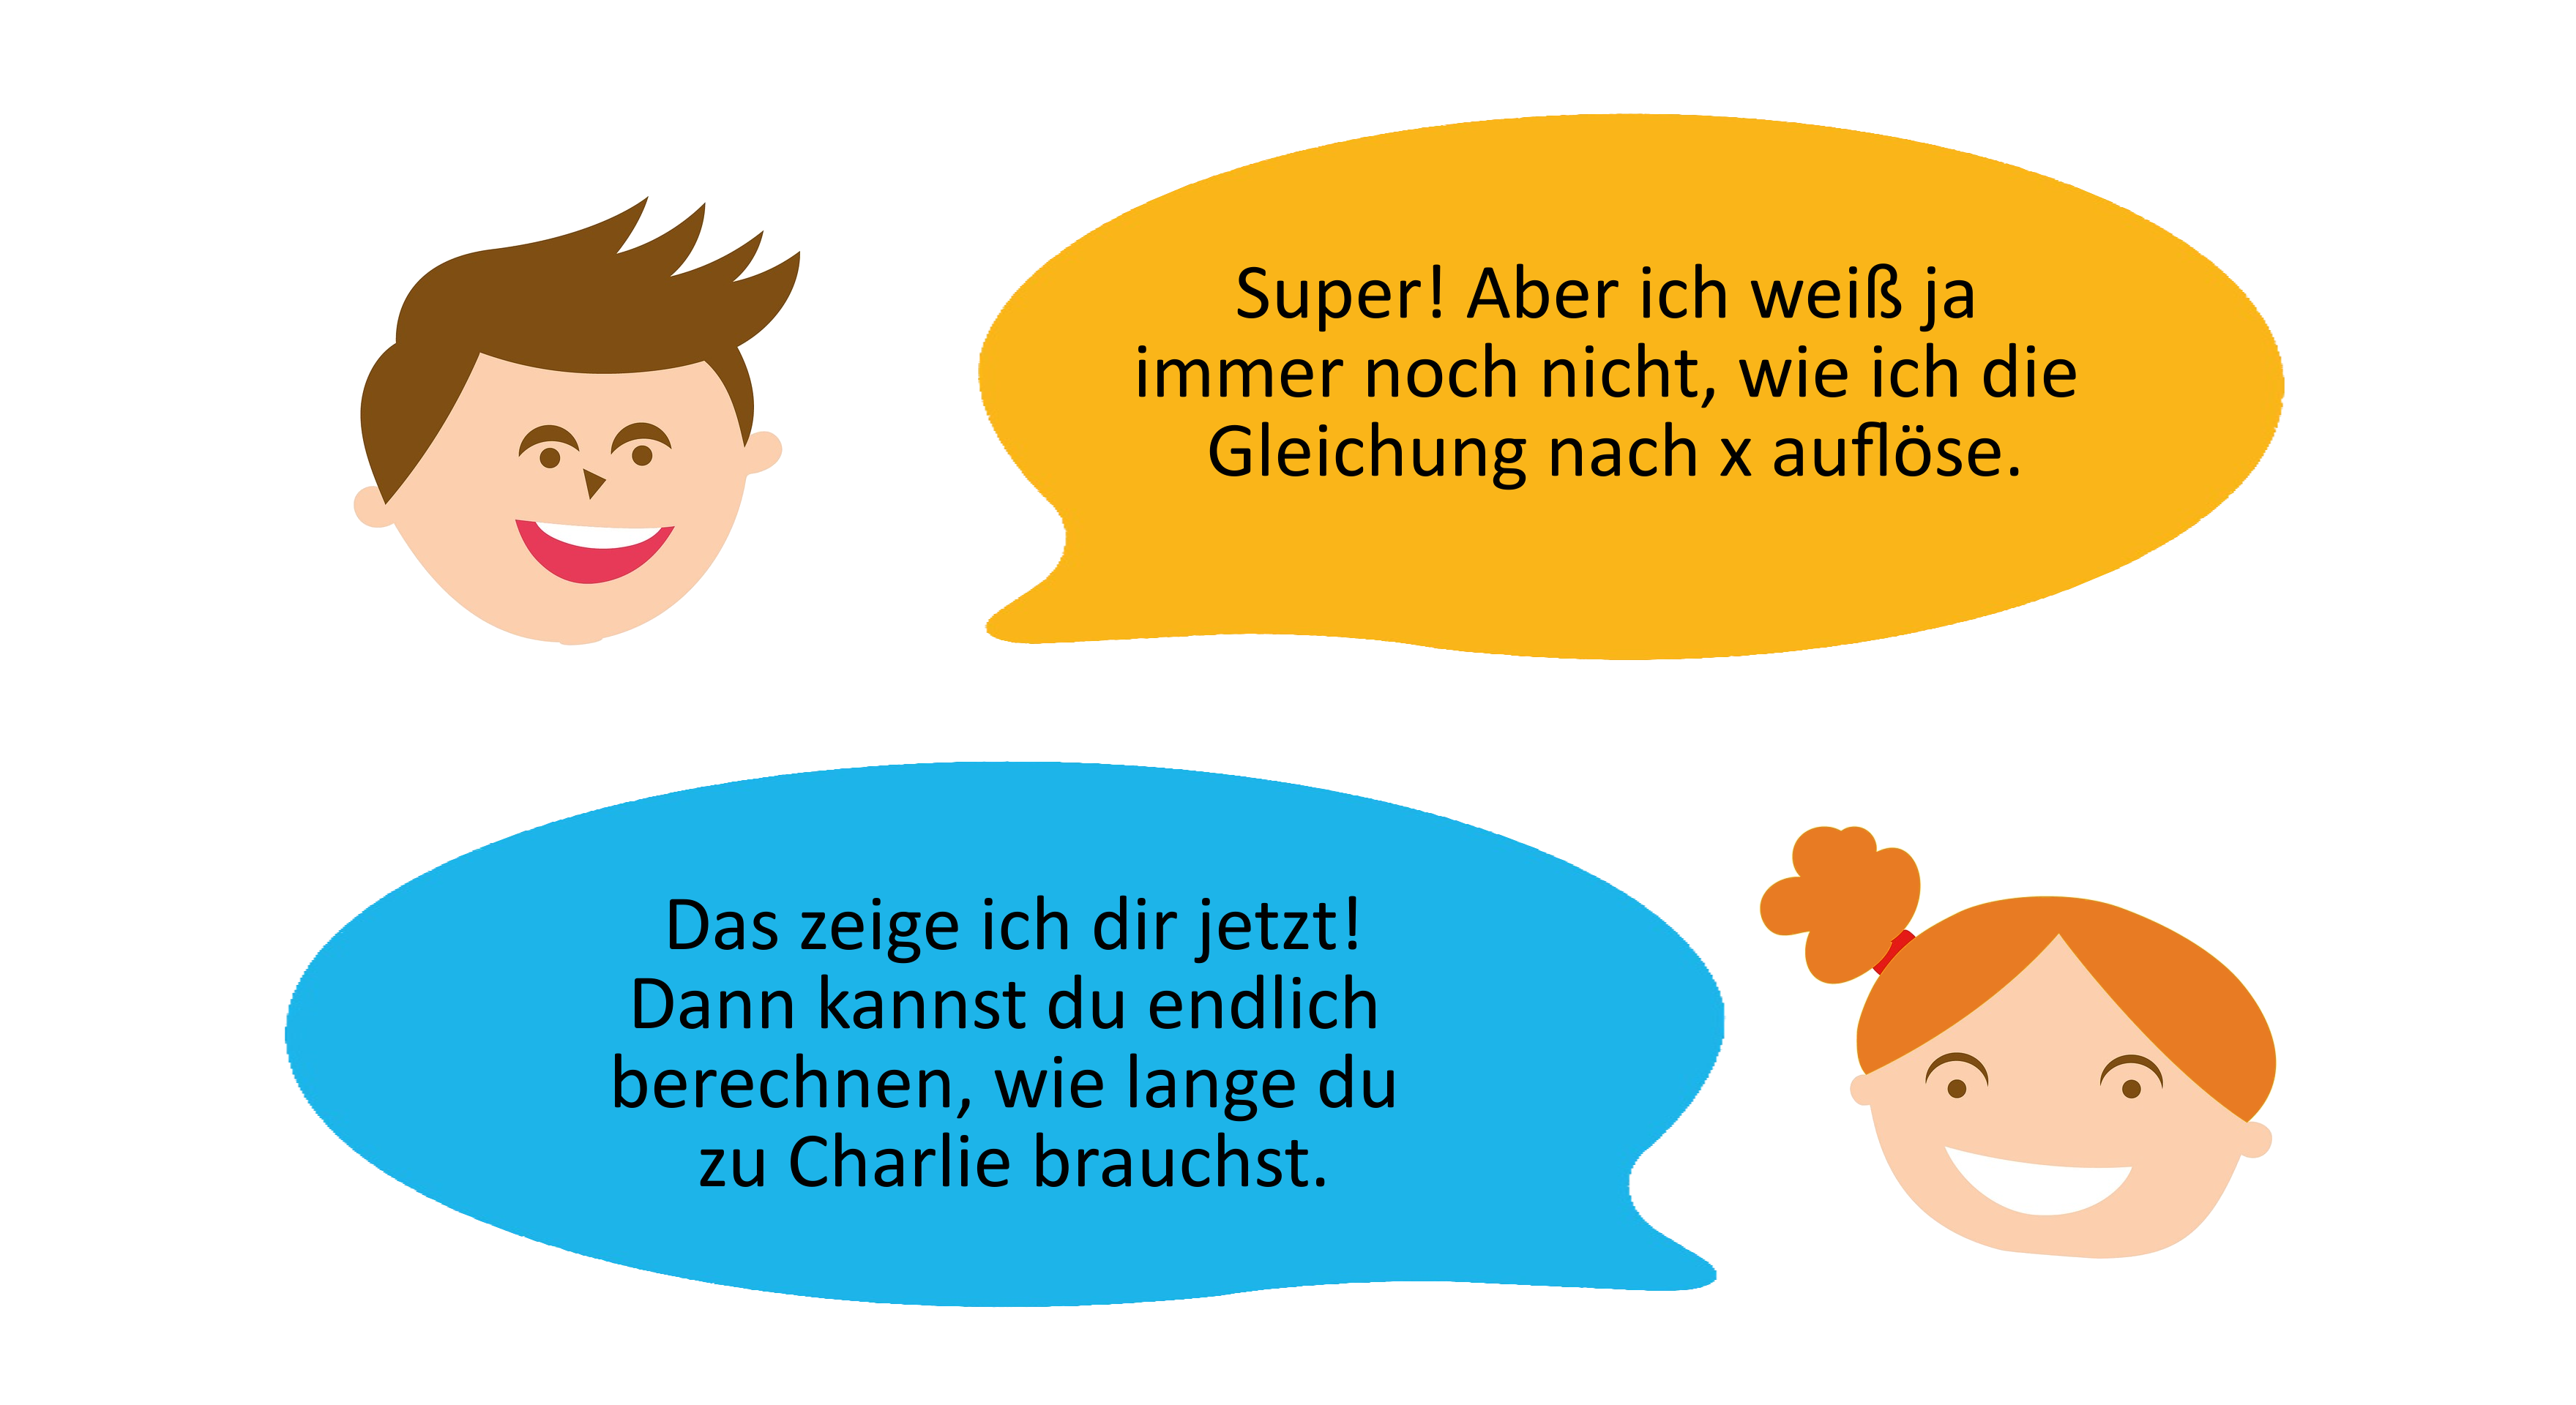 Charmant Lösen Mathe Frei Ideen - Gemischte Übungen Arbeitsblätter ...